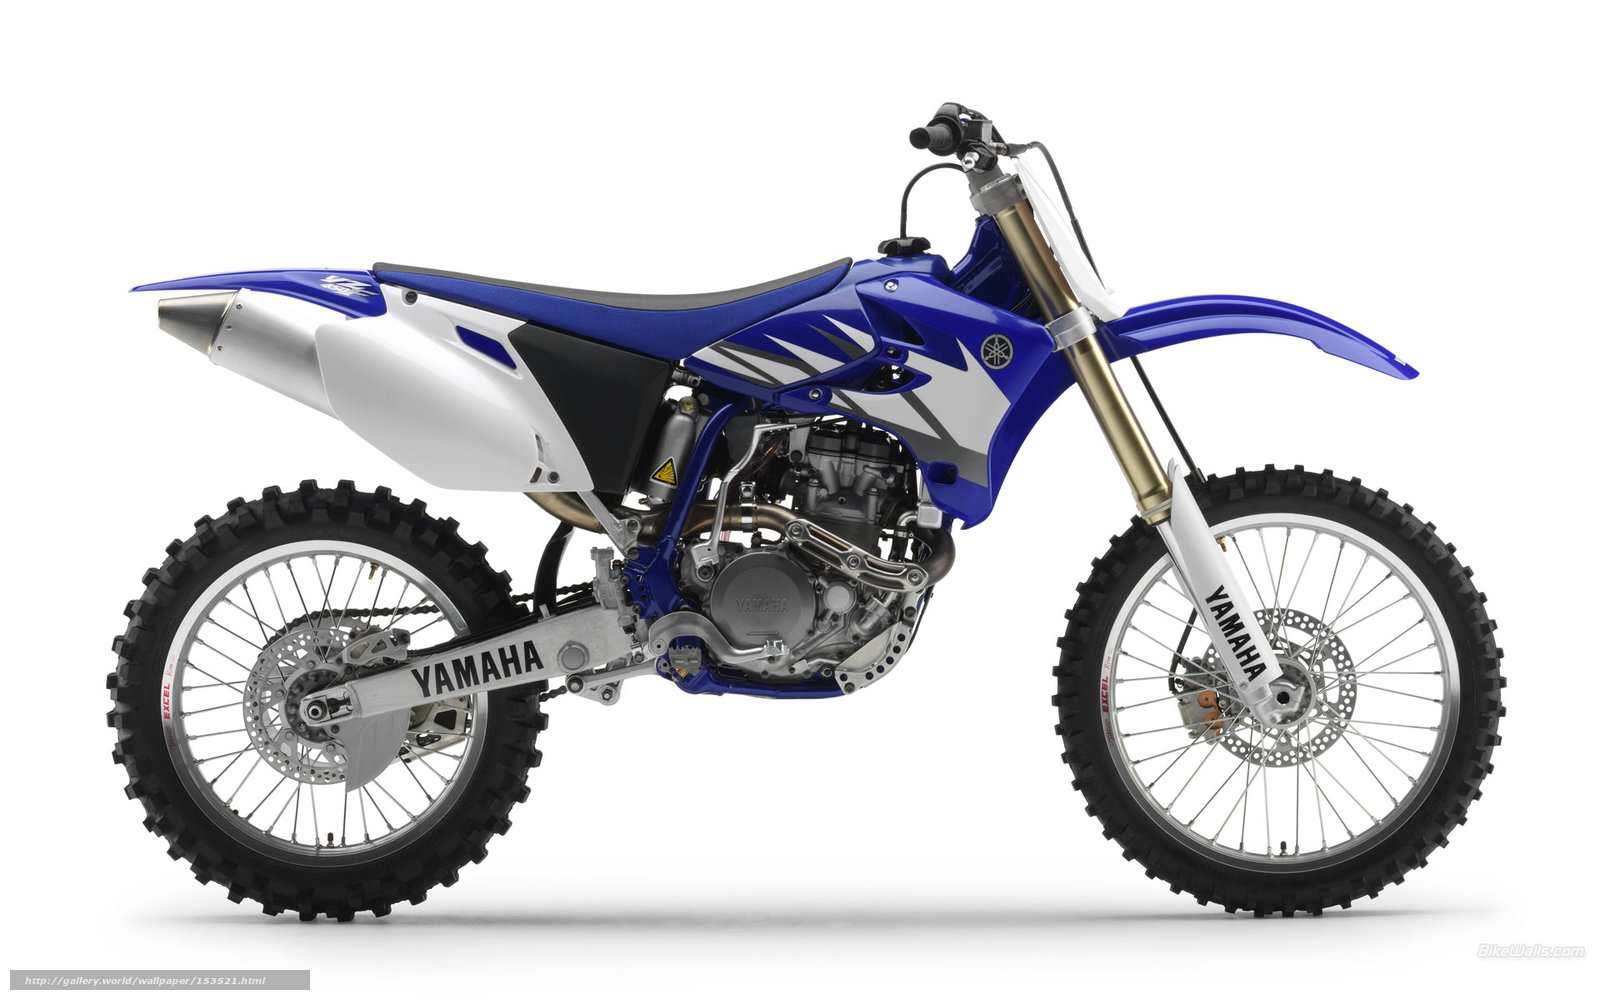 Yamaha Yz450f Dirt Motorcycle Wallpaper Hd Desktop: Download Wallpaper Yamaha, Motocross, YZ450F, 2005 YZ450F